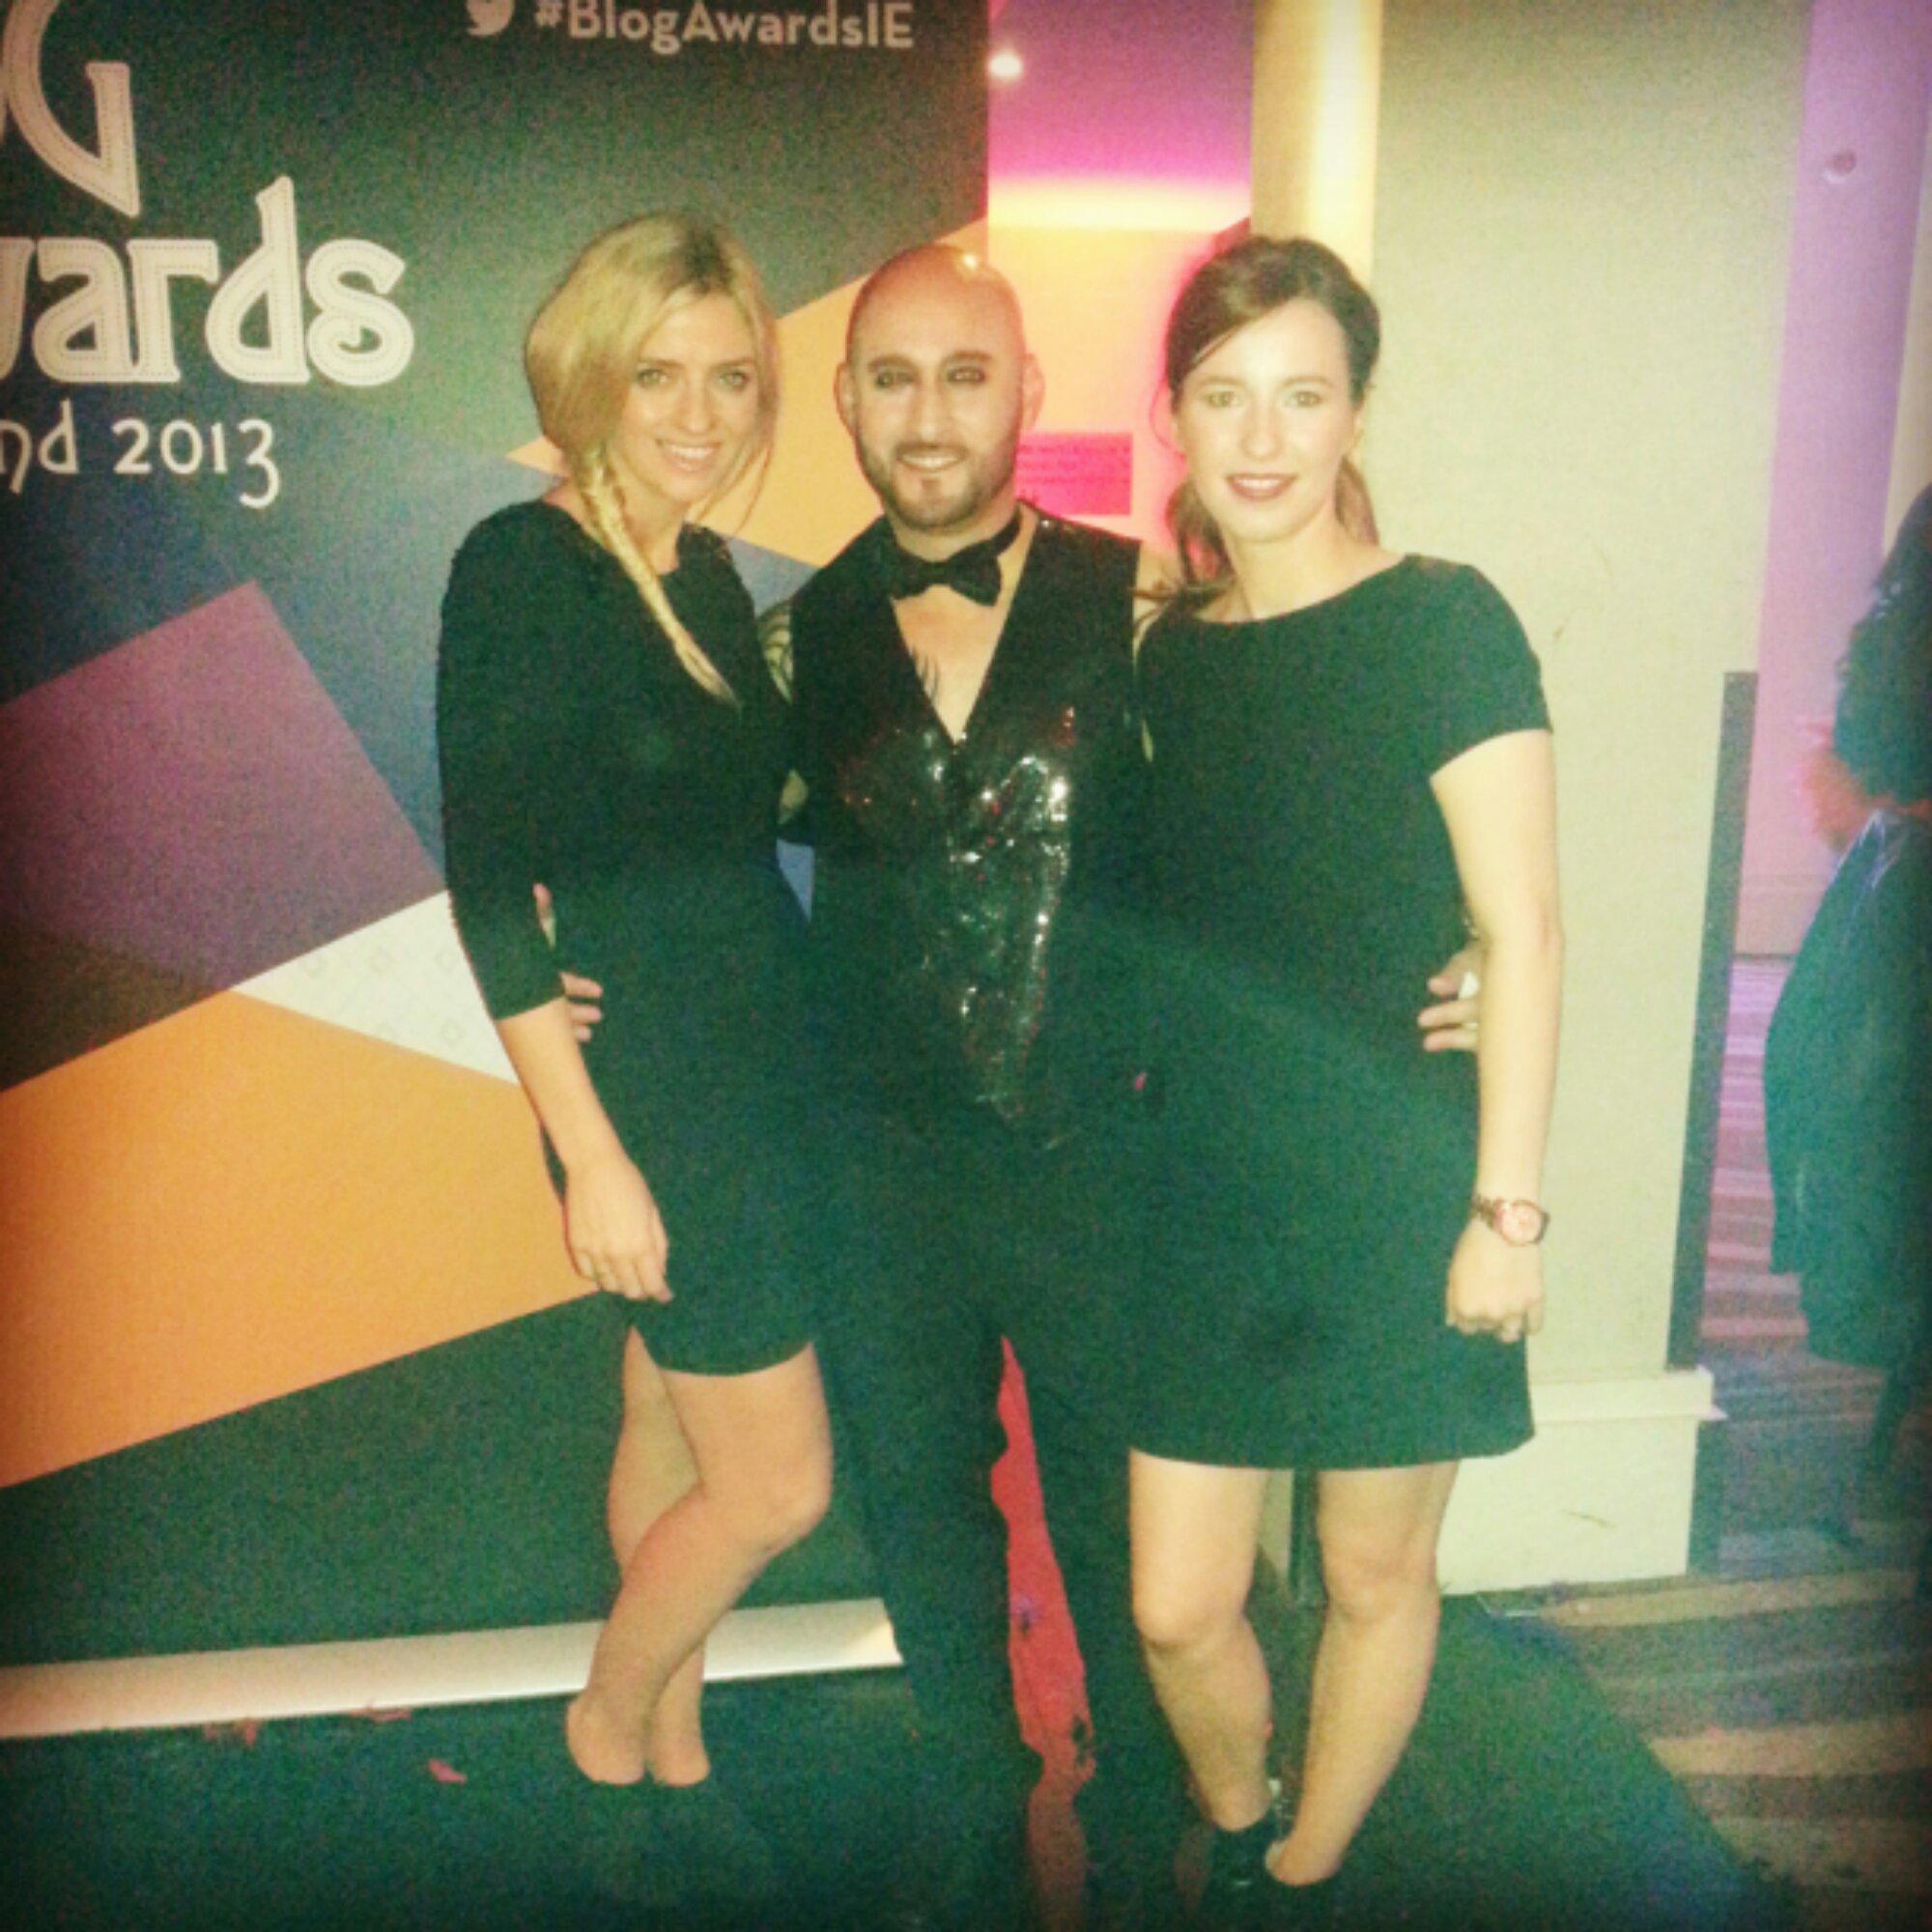 Blog Awards 2013 3